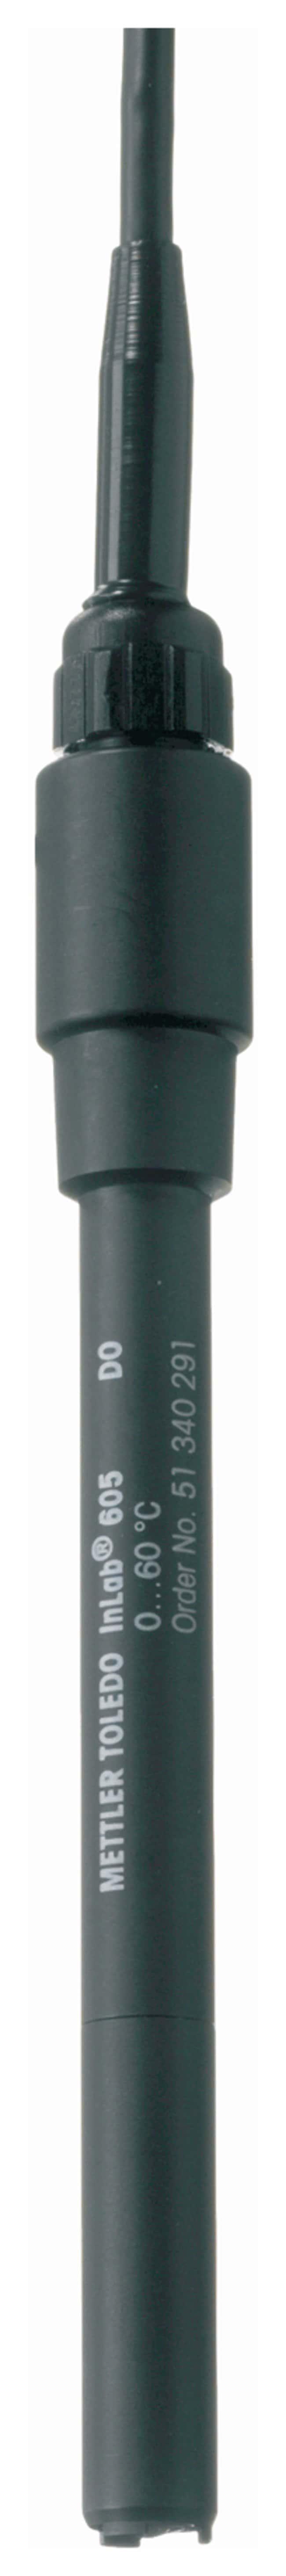 Mettler Toledo™SevenGo™ Dissolved Oxygen Replacement Electrode InLab™ 605